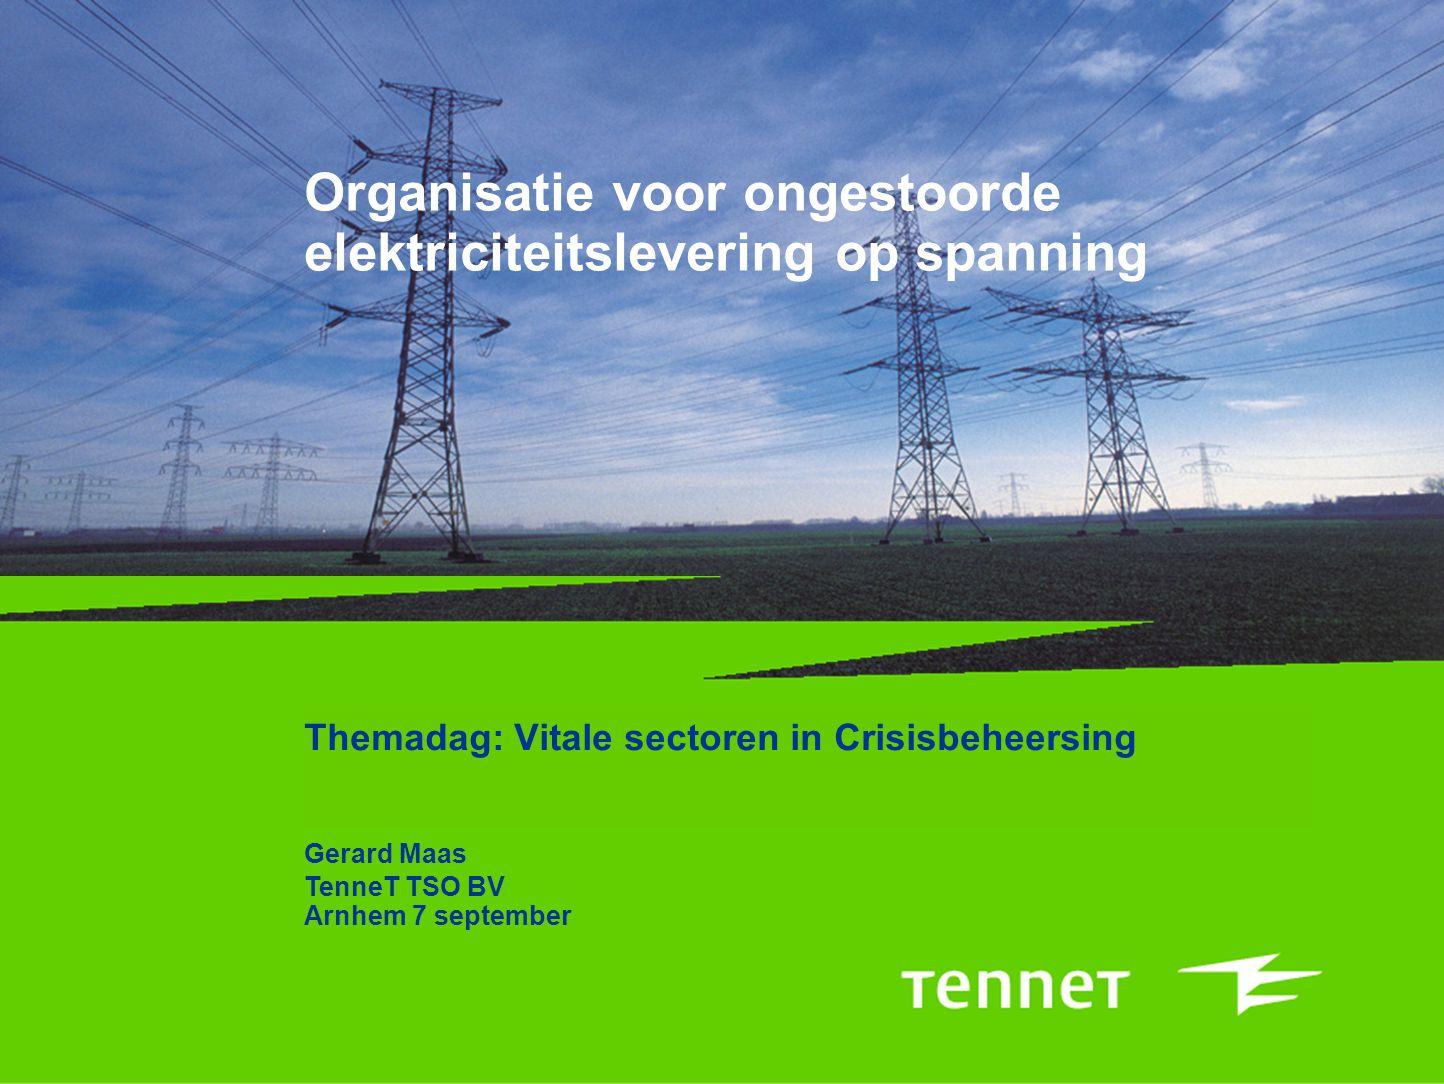 Organisatie voor ongestoorde elektriciteitslevering op spanning